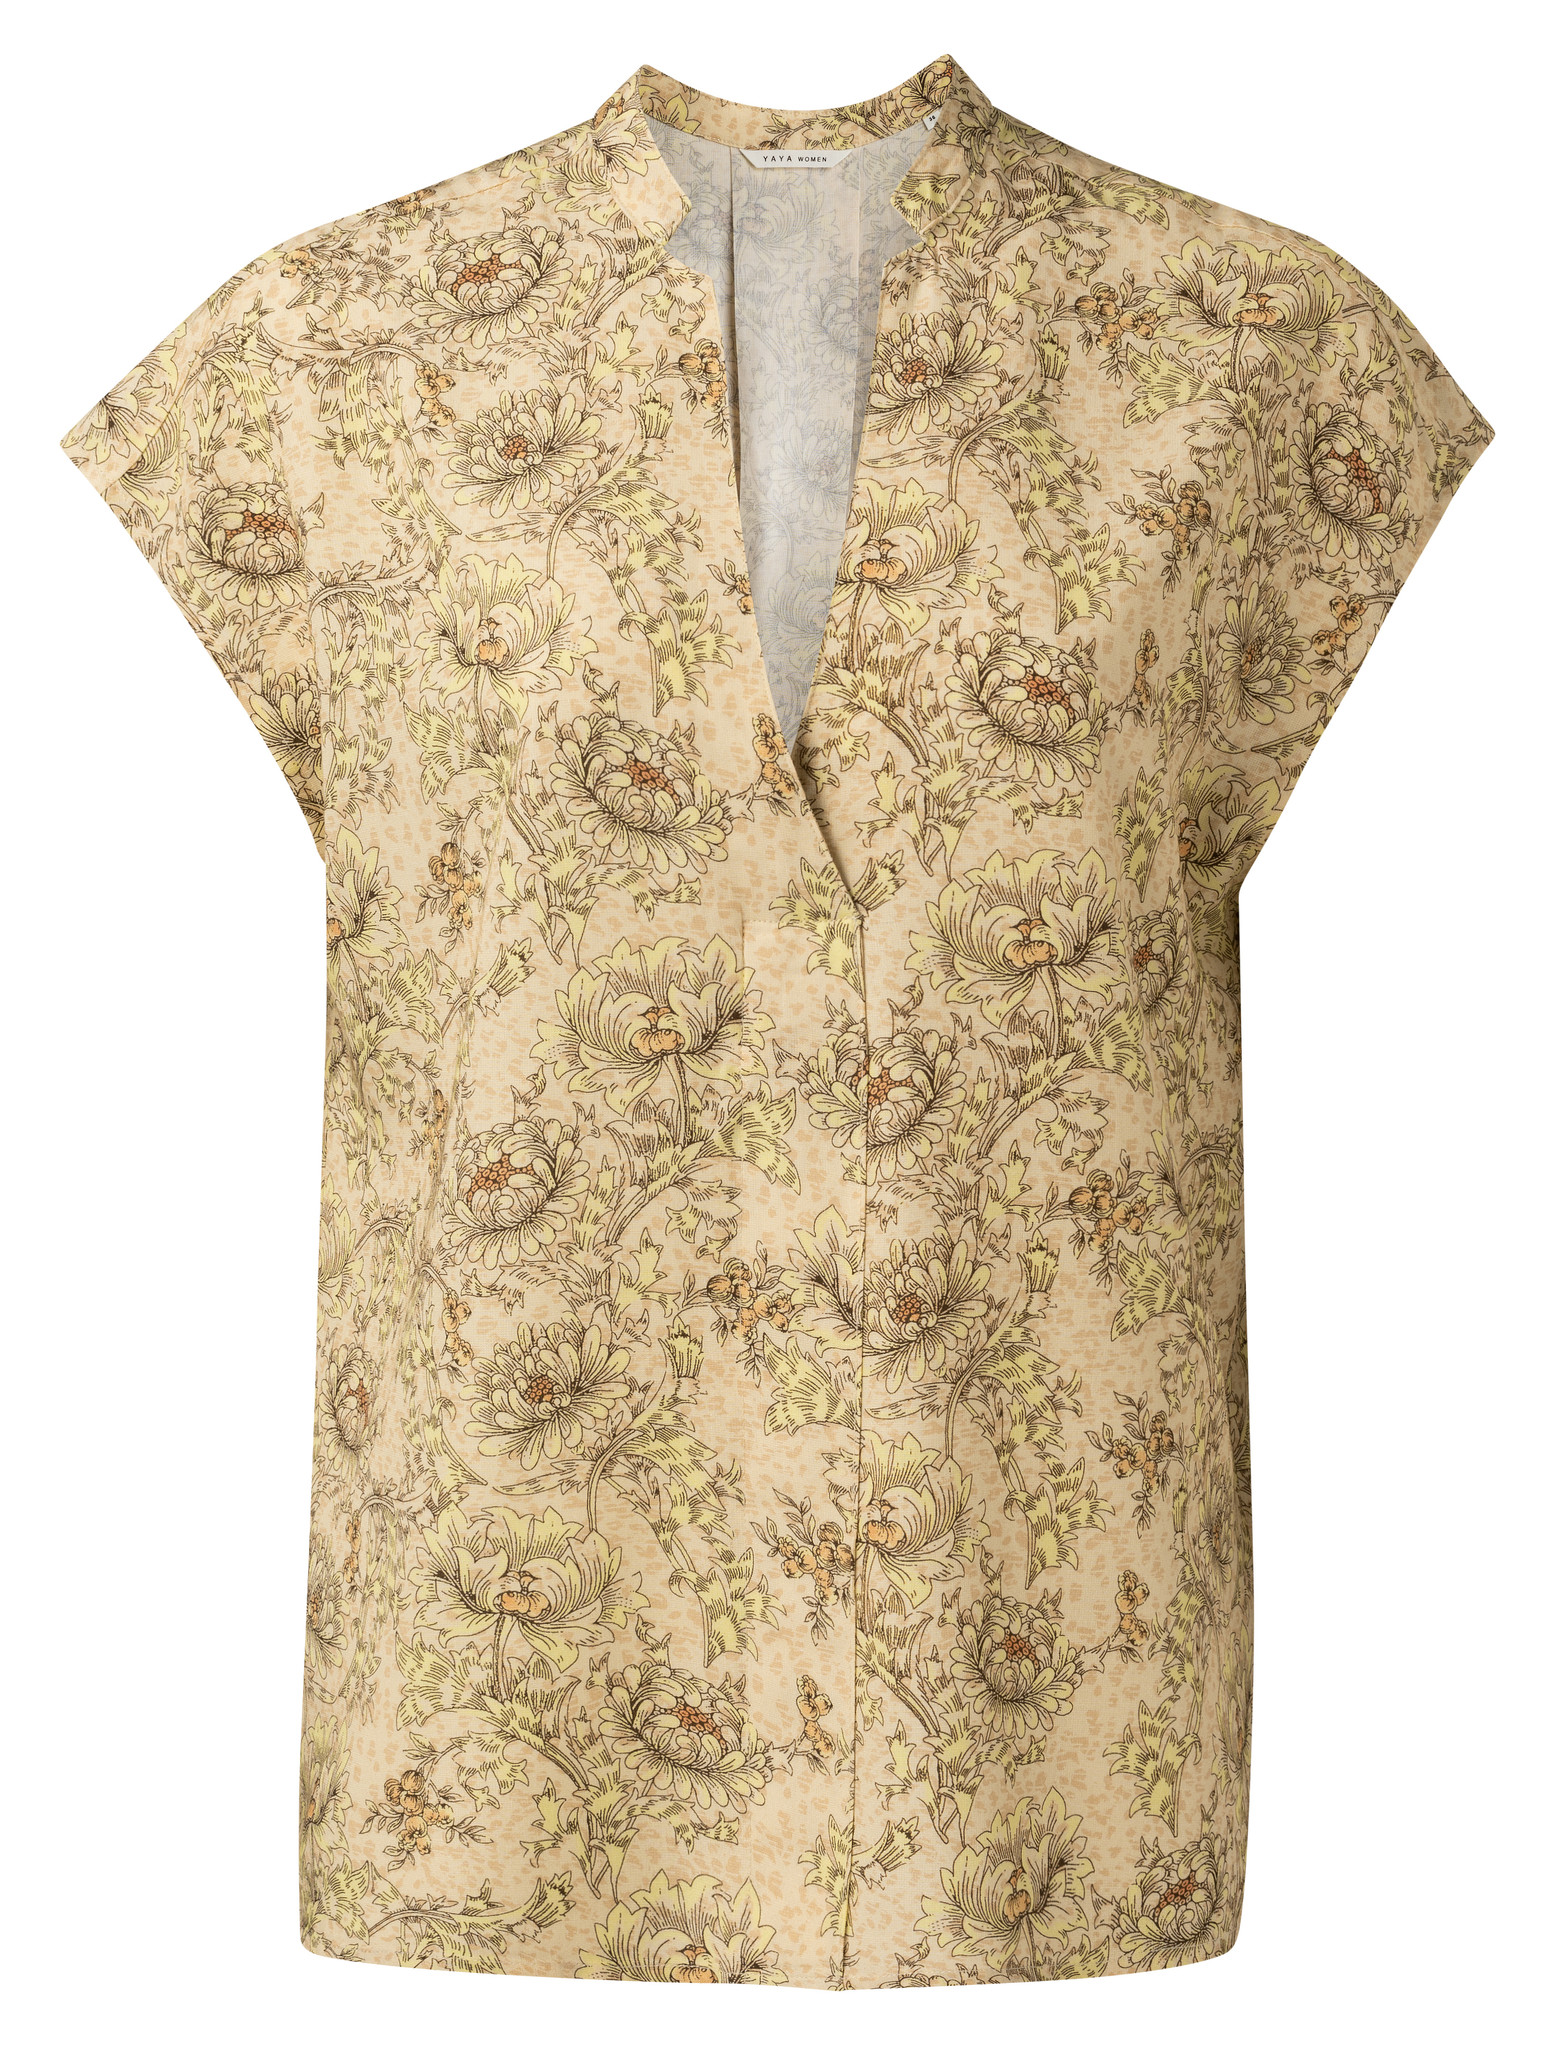 yaya Printed v-neck top 1901437-115-1